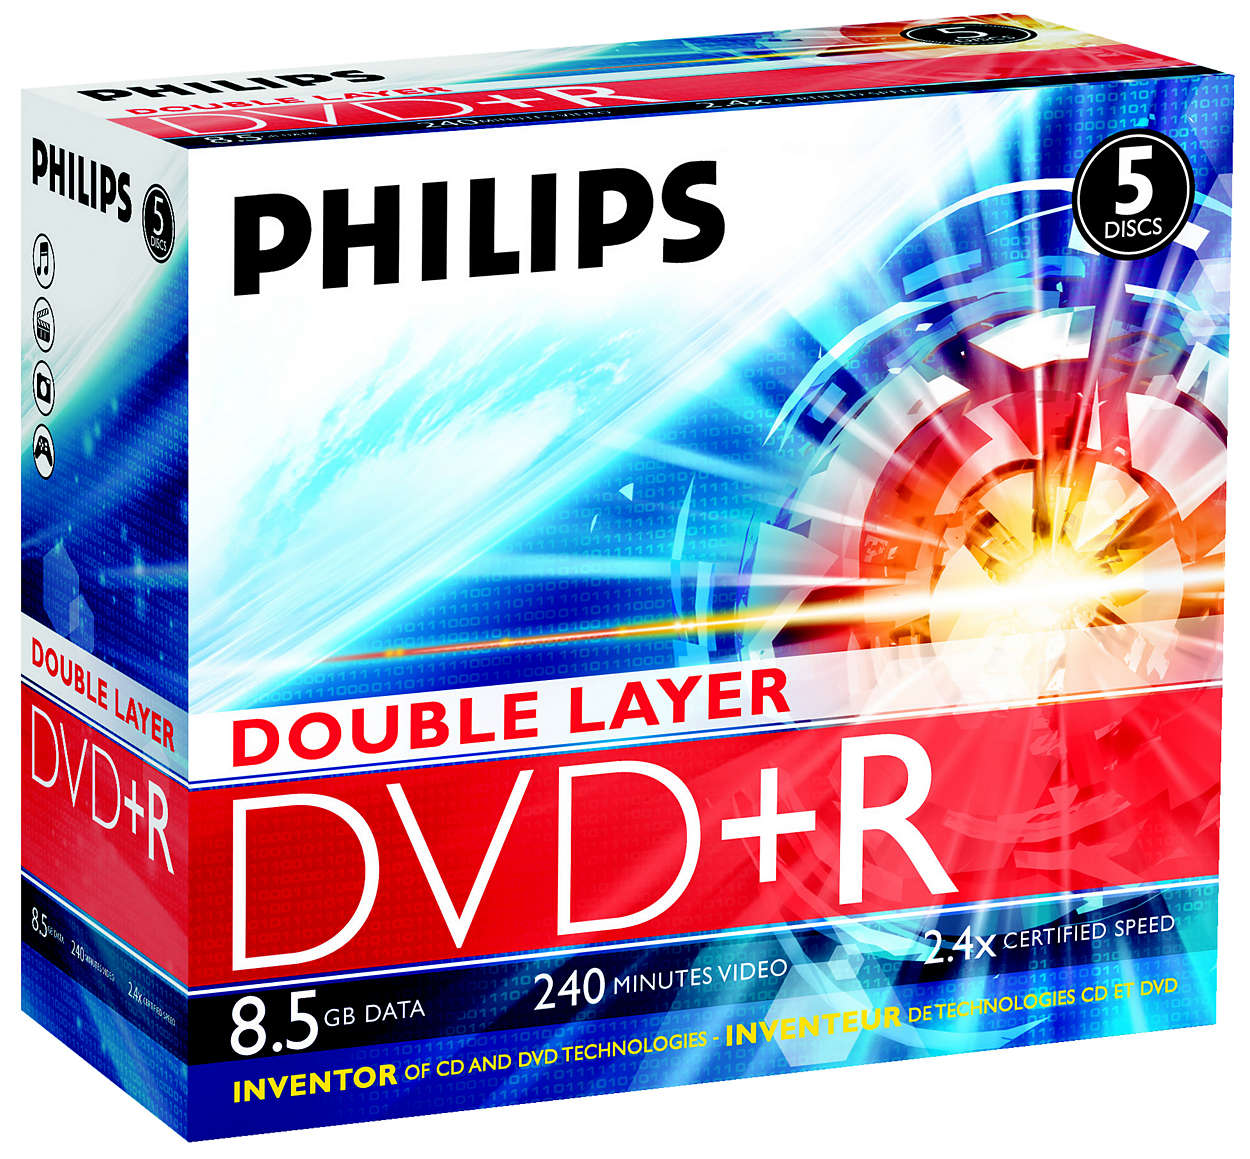 Innovator of CD and DVD technologies!